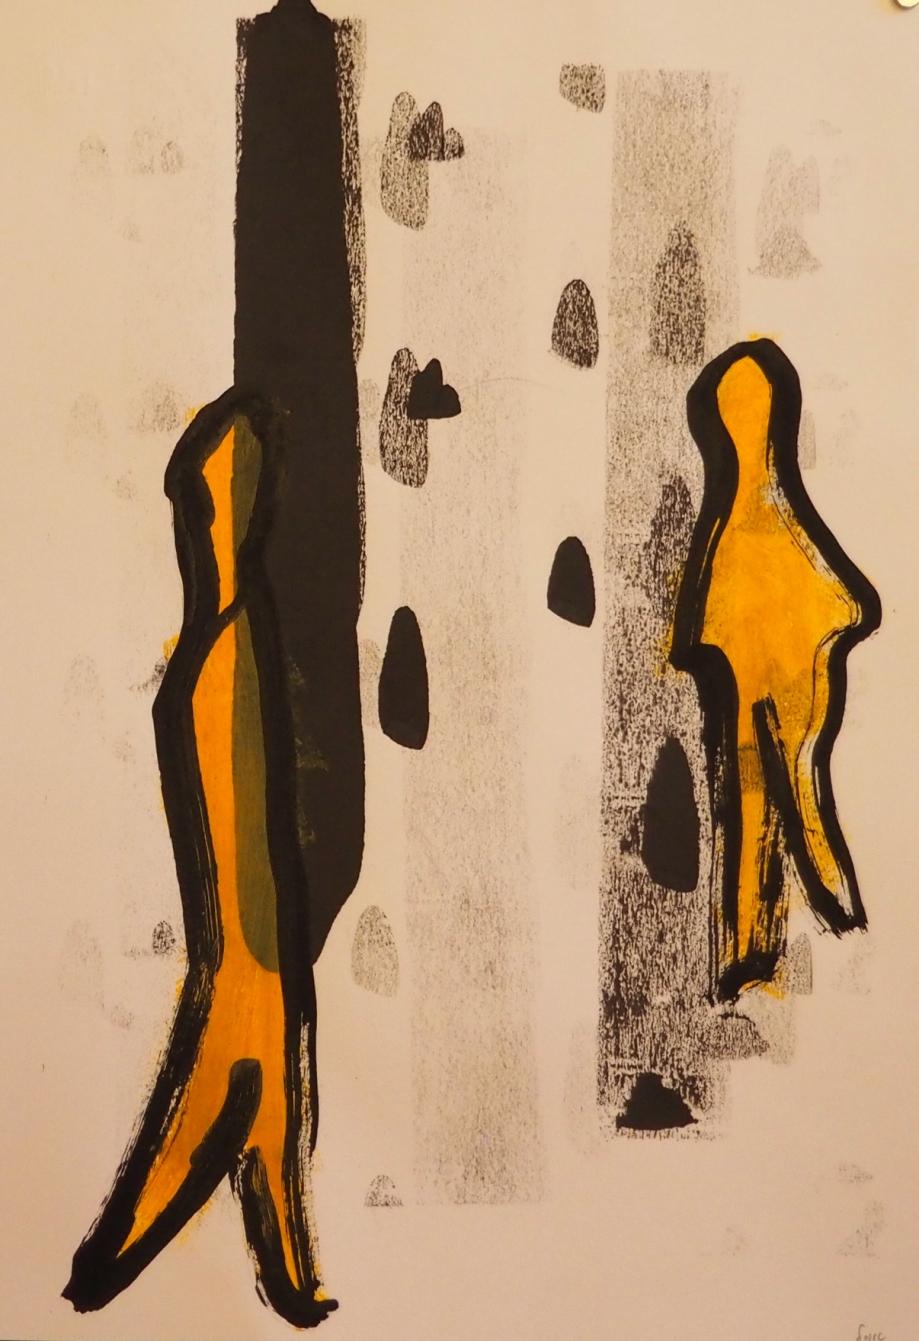 Memes 7, 33 x 48 cm; Gouache on Paper; Sojic, 2018